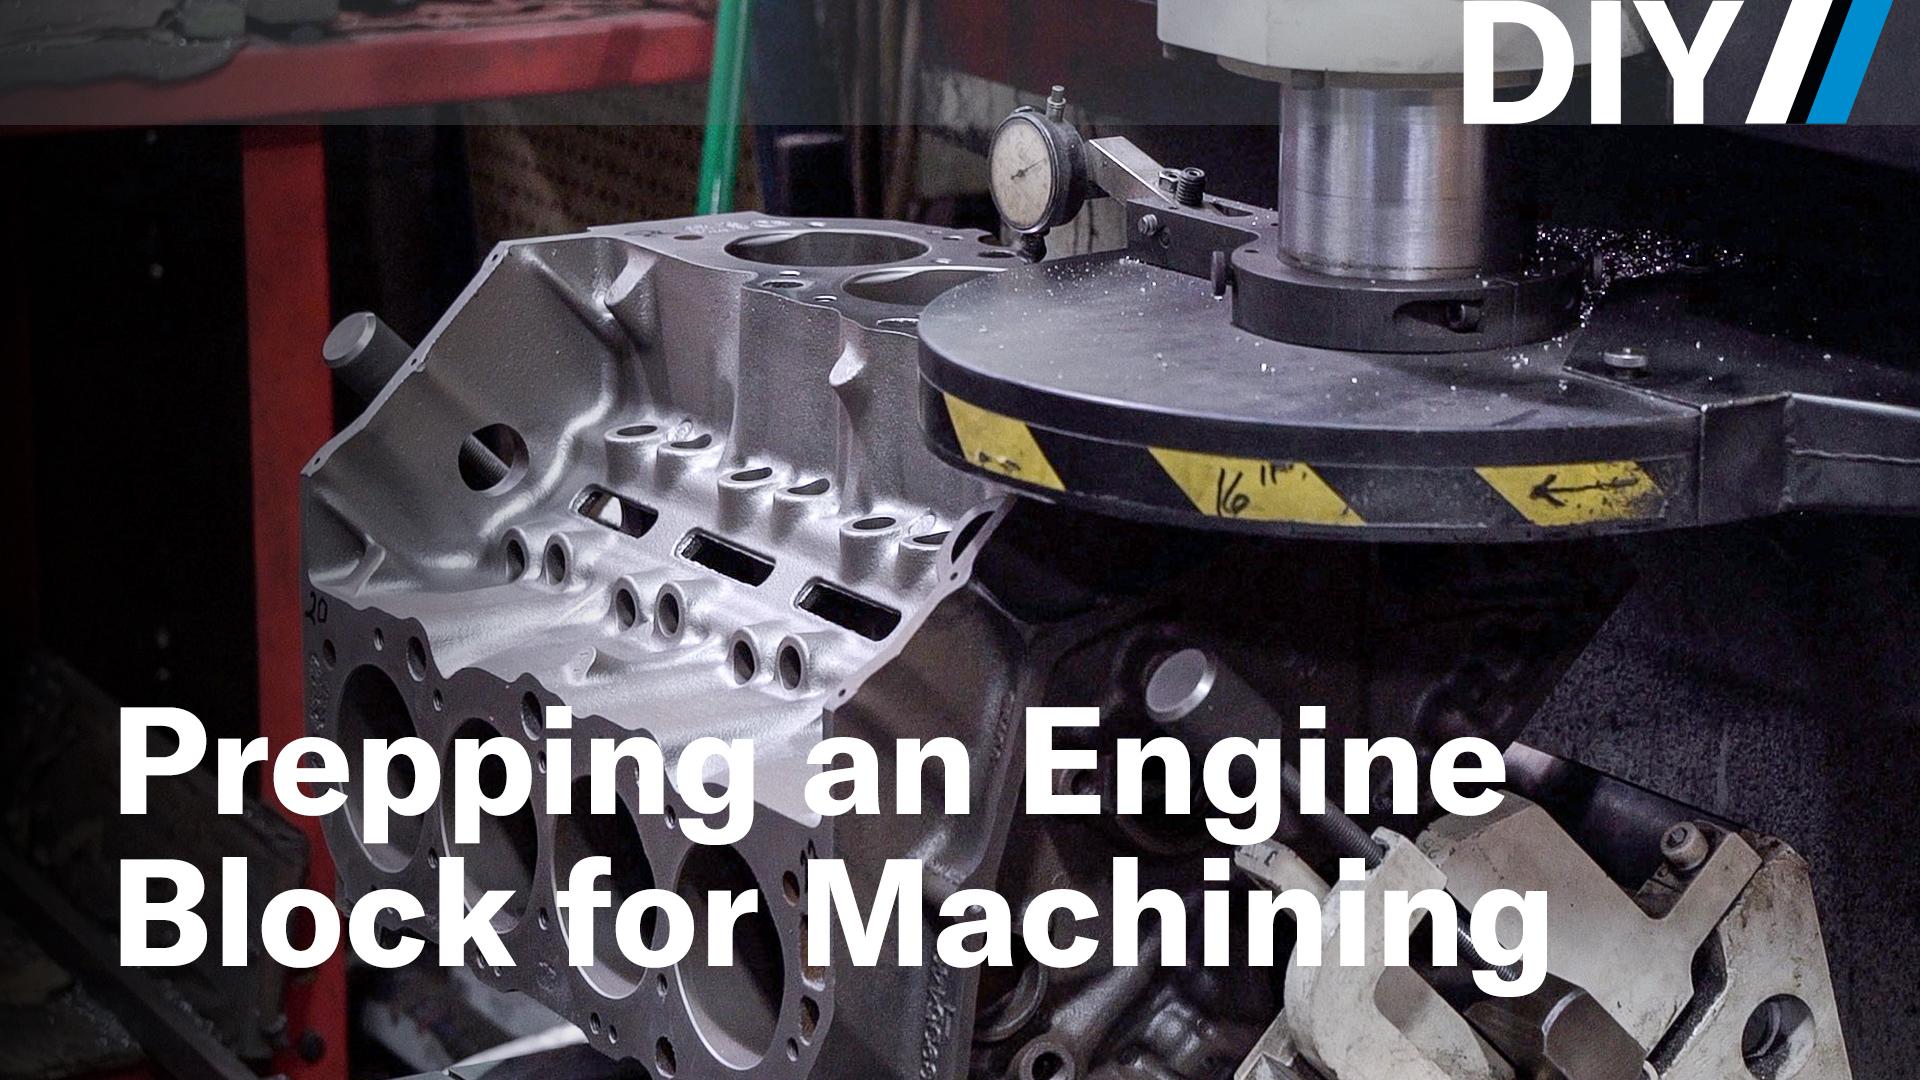 DIY prepping an engine block